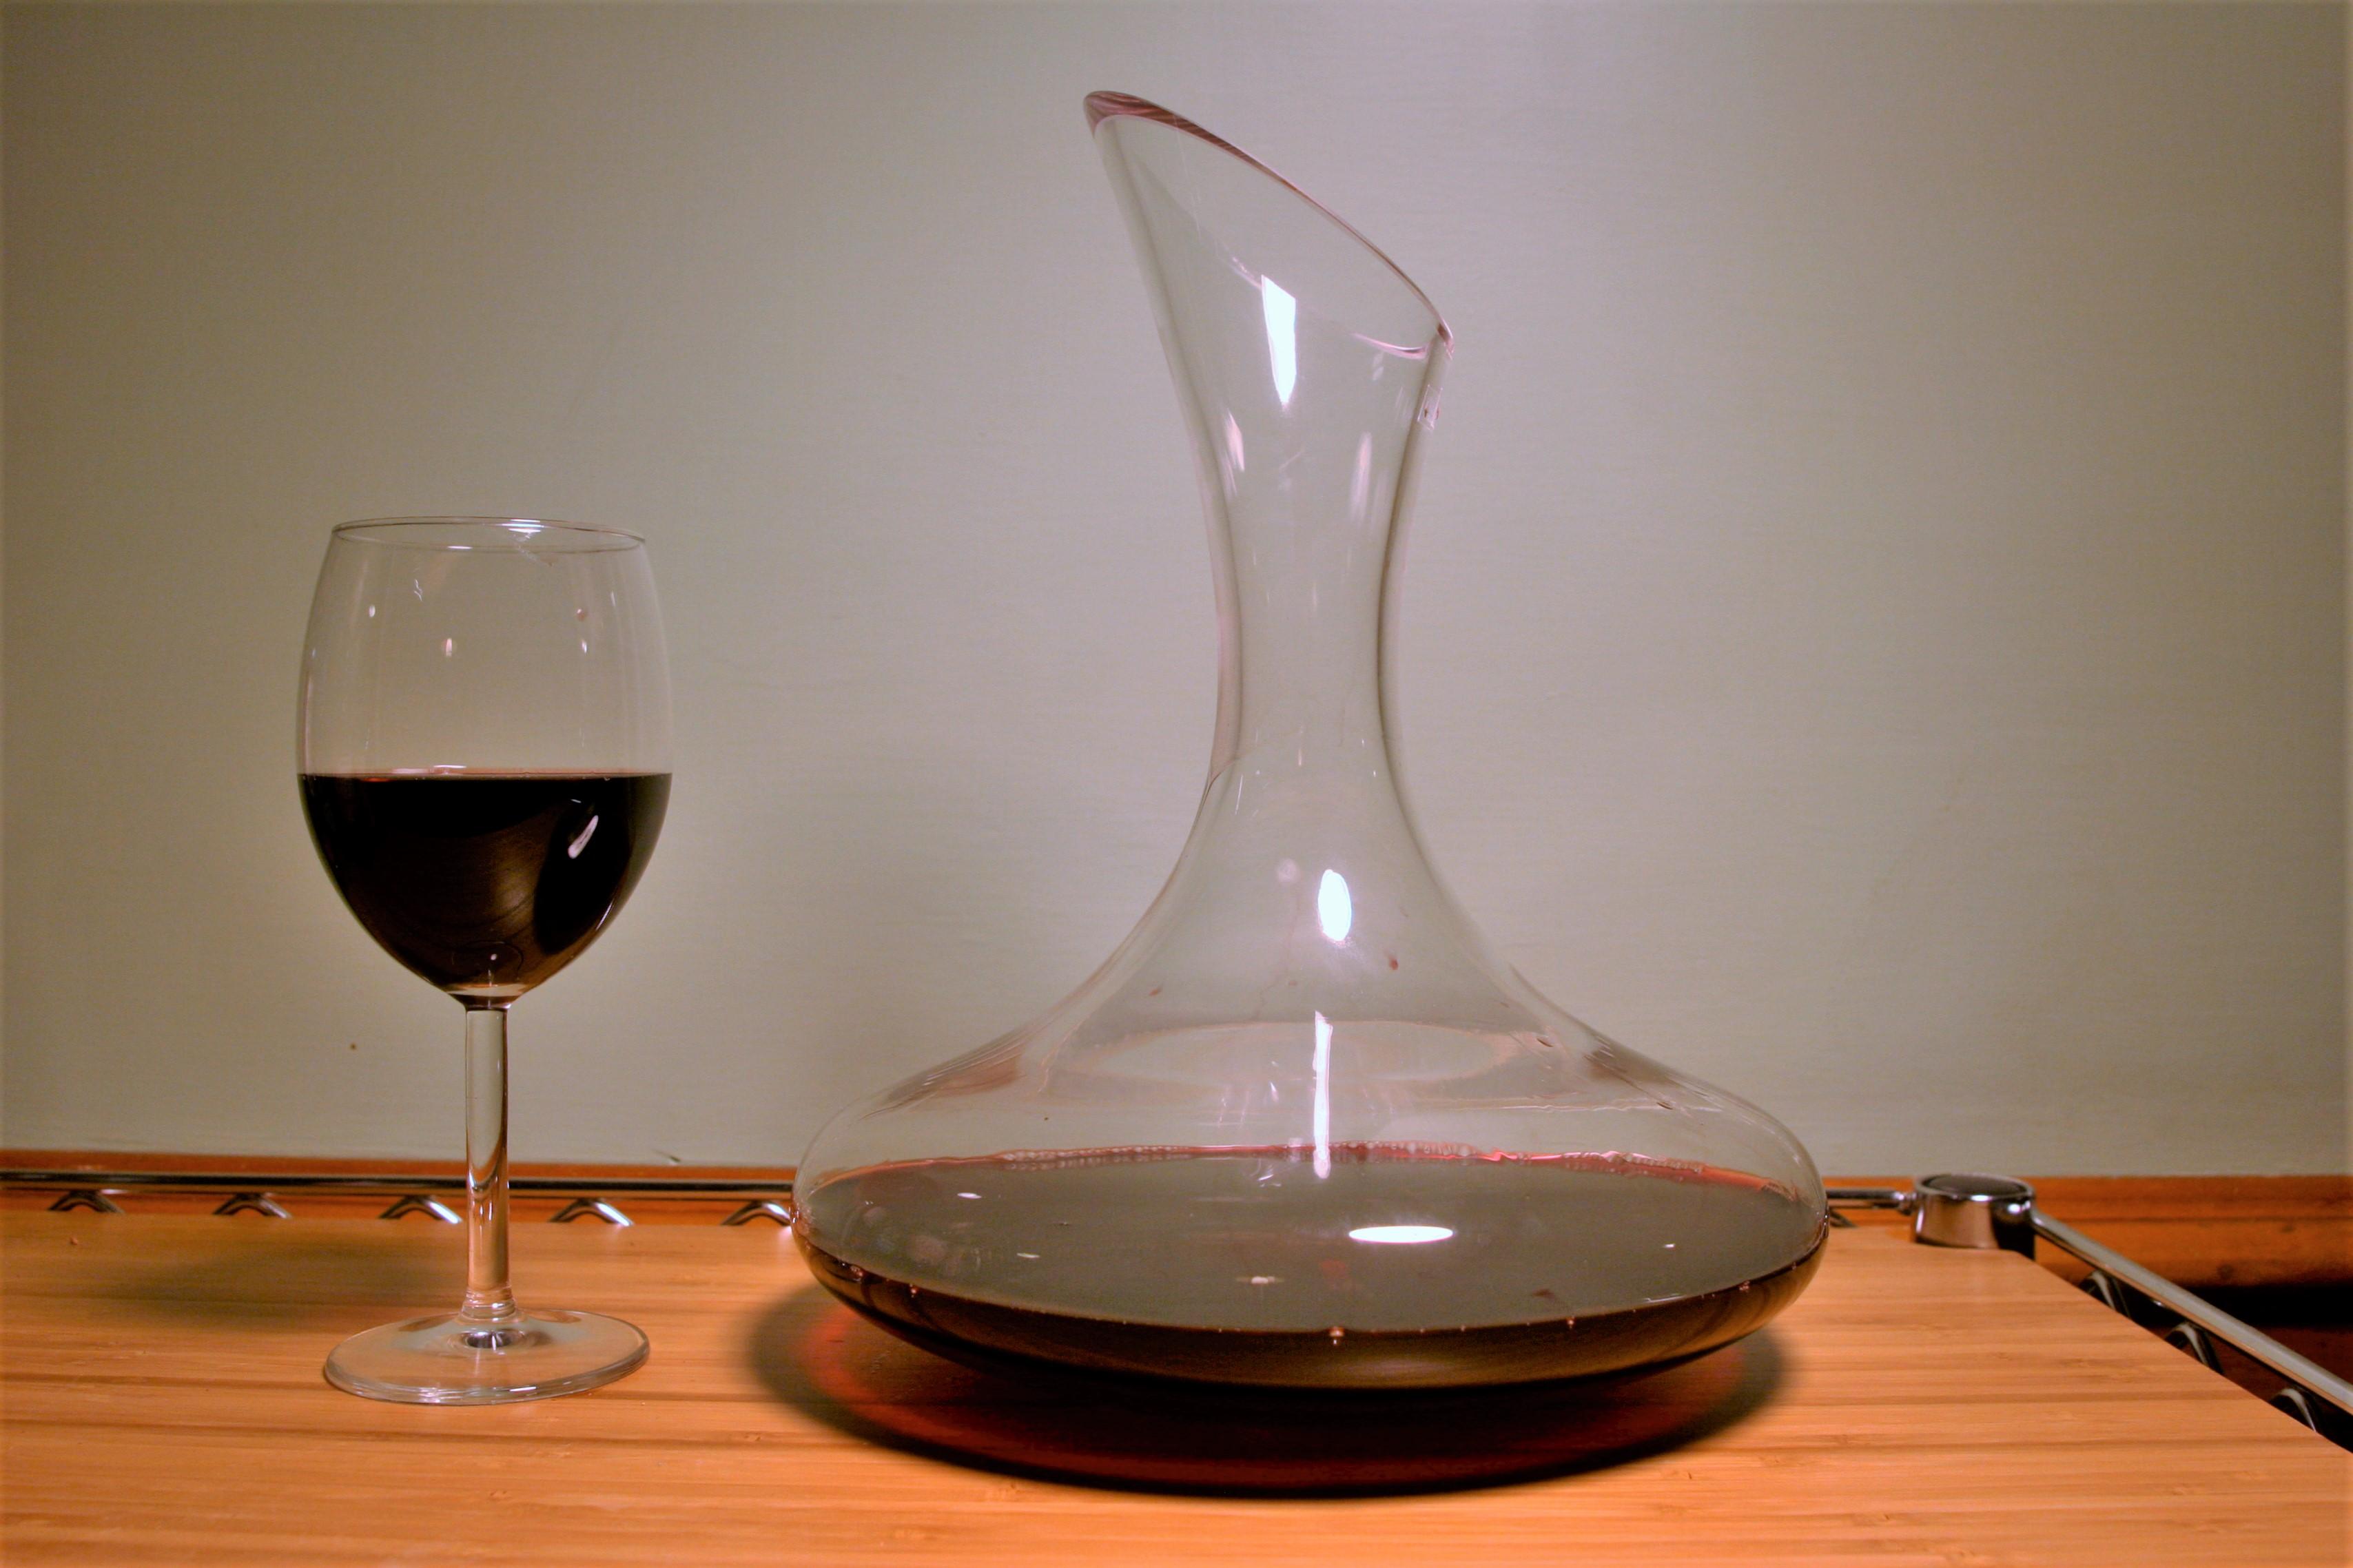 Hacete tu propio vino. 5 pasos.